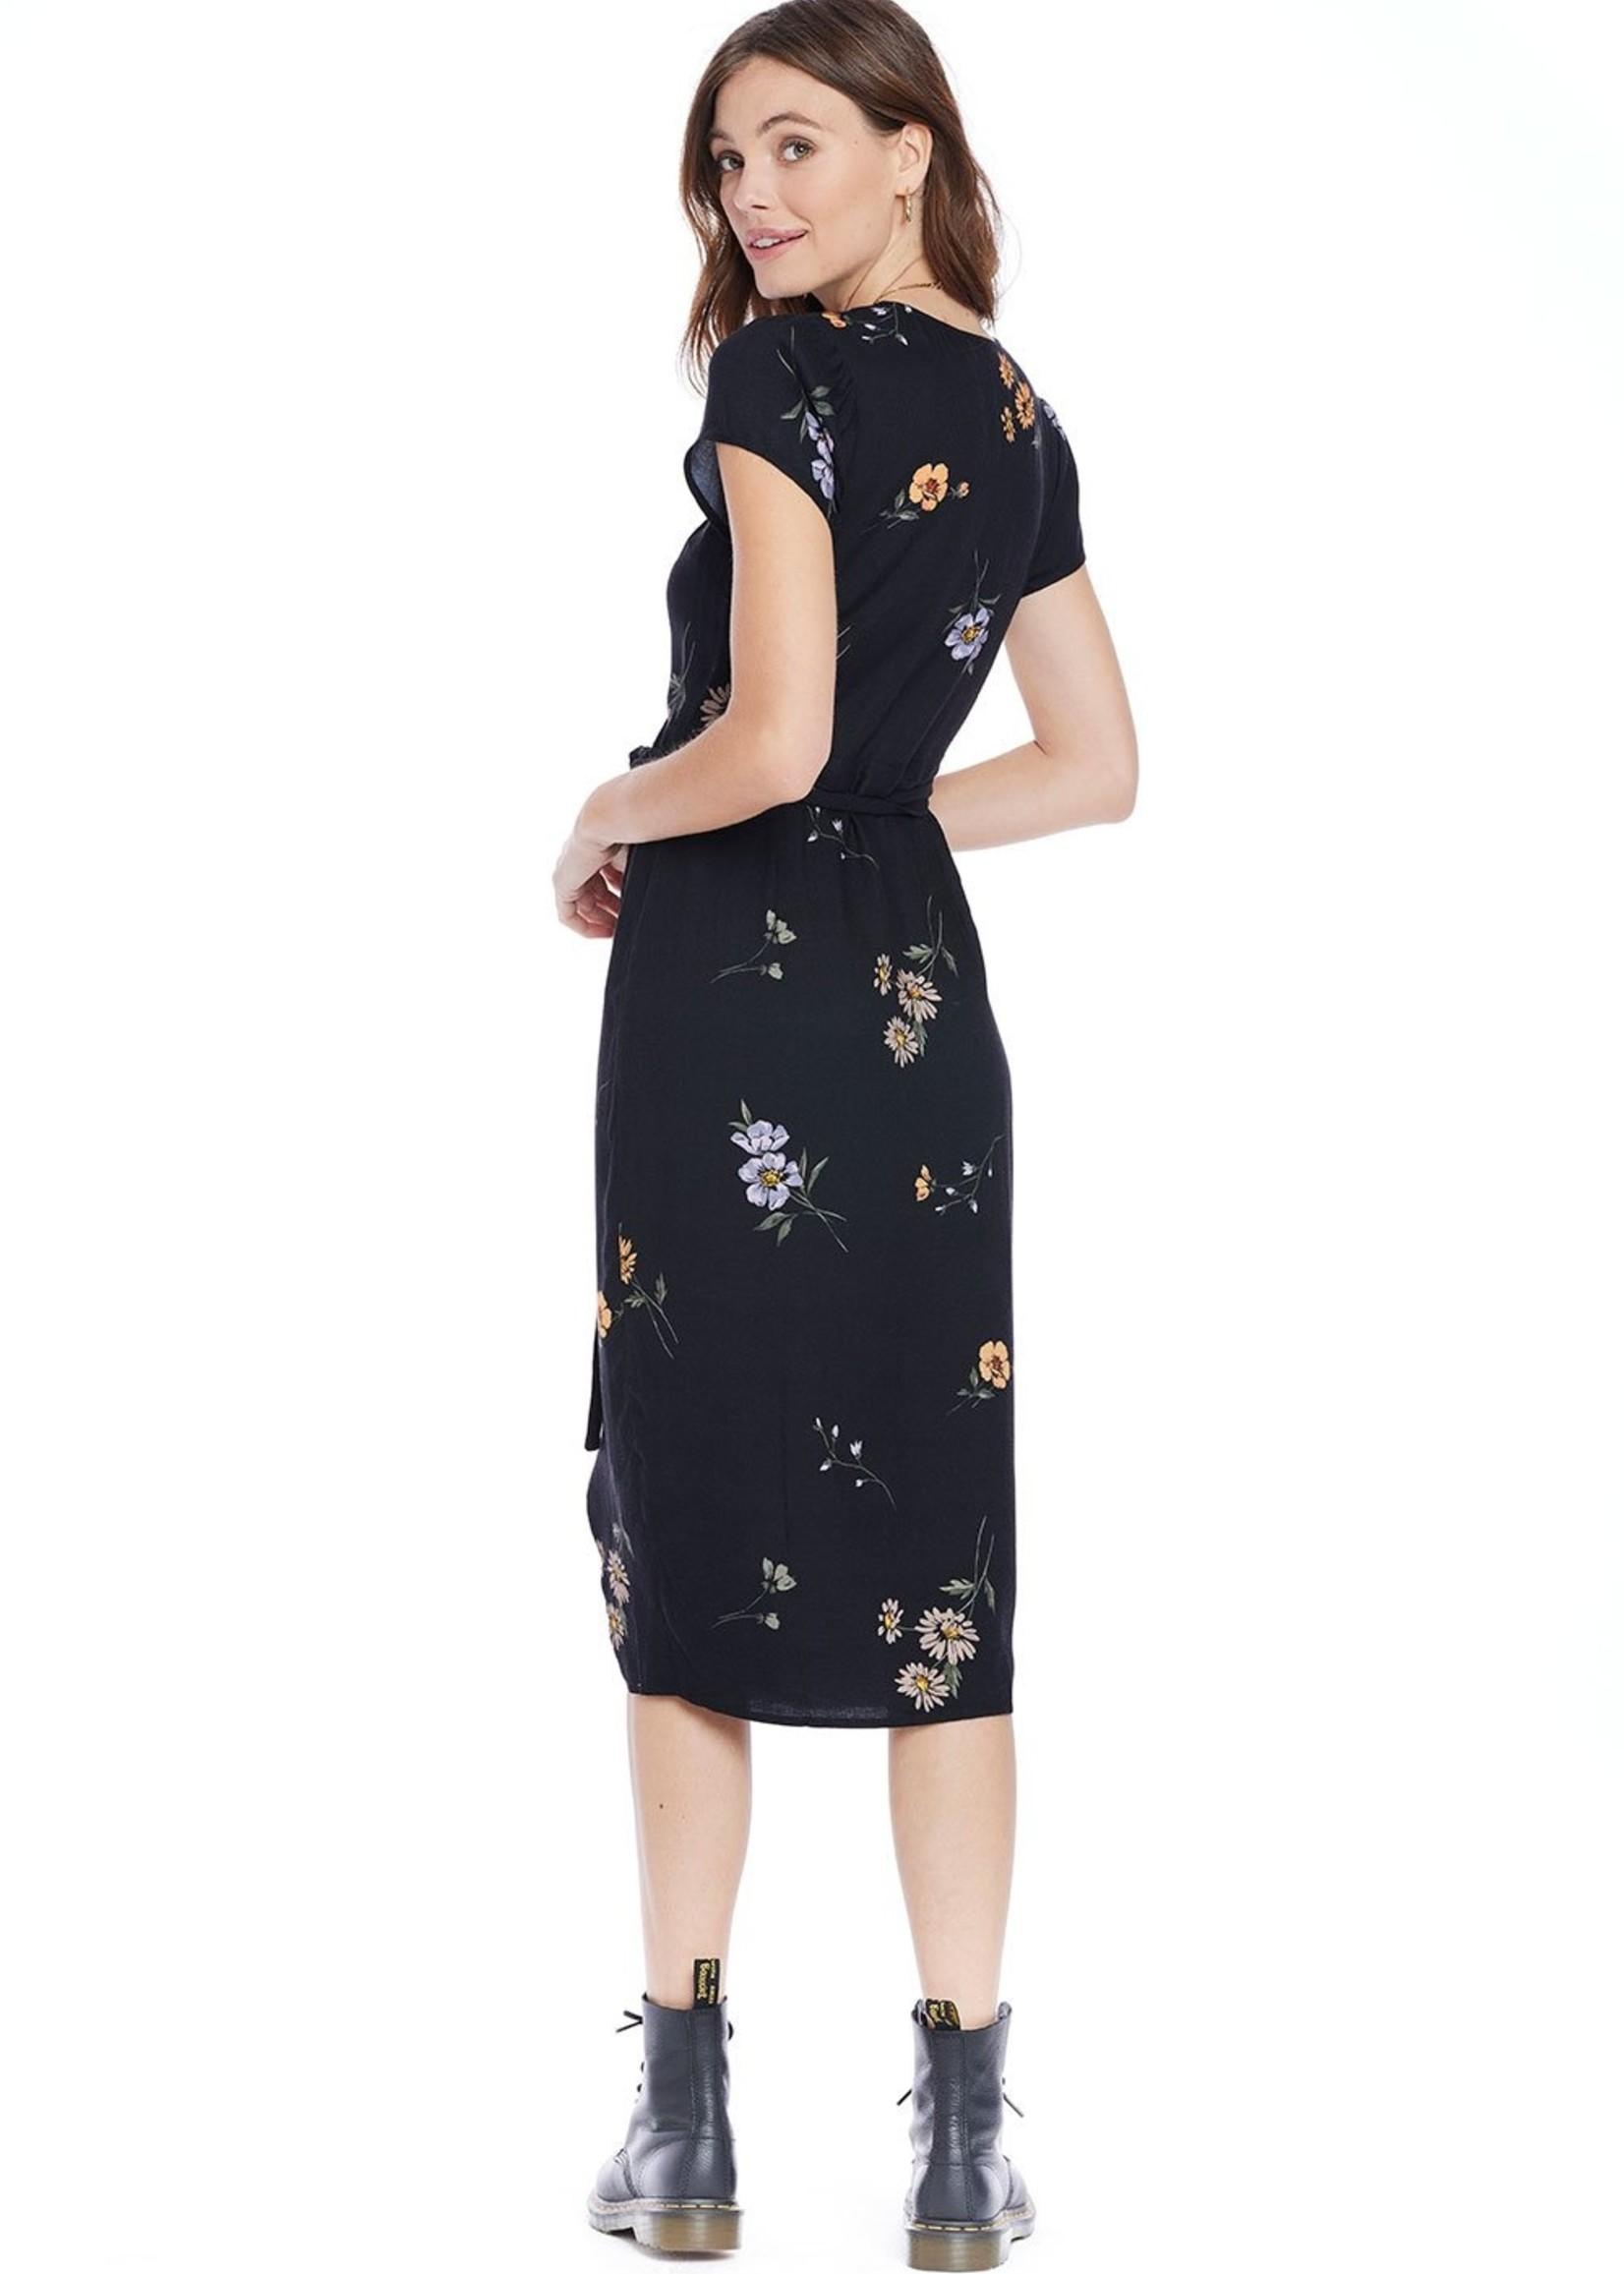 SALTWATER LUXE VICTORIA Midi Dress